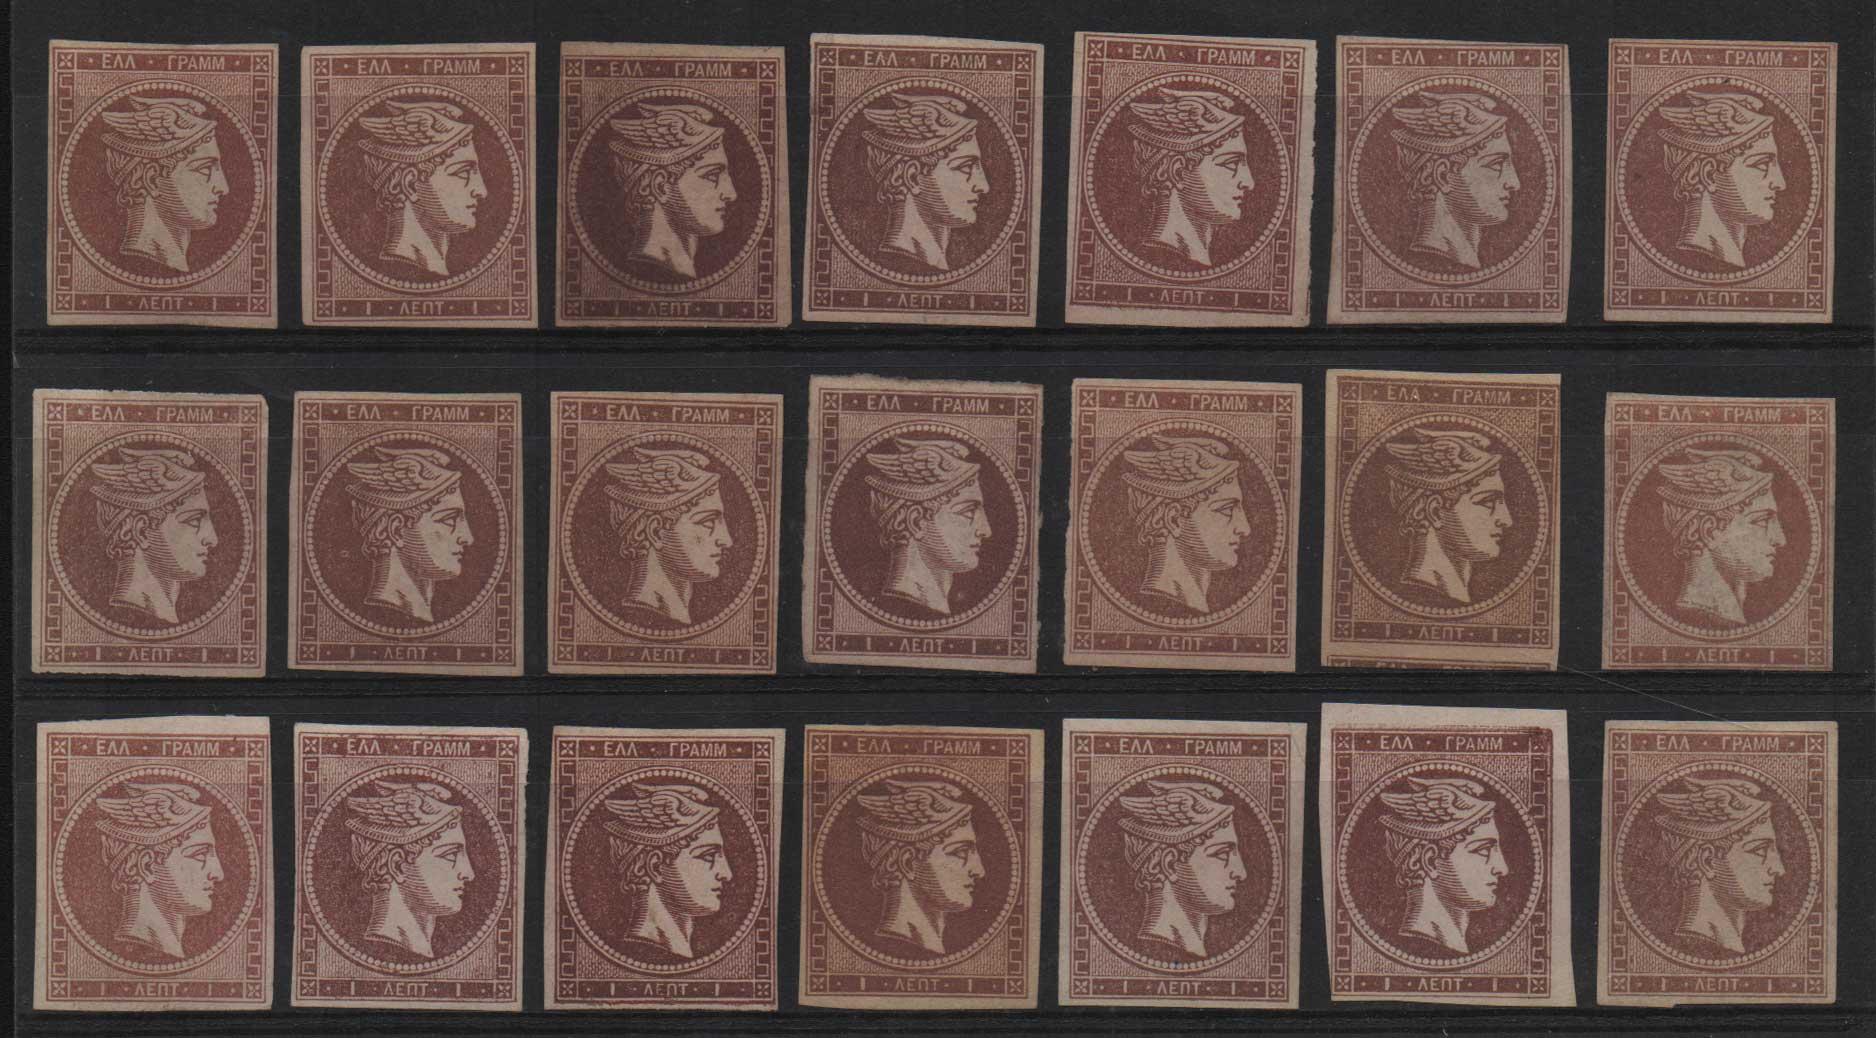 Lot 11 - -  LARGE HERMES HEAD large hermes head -  Athens Auctions Public Auction 69 General Stamp Sale